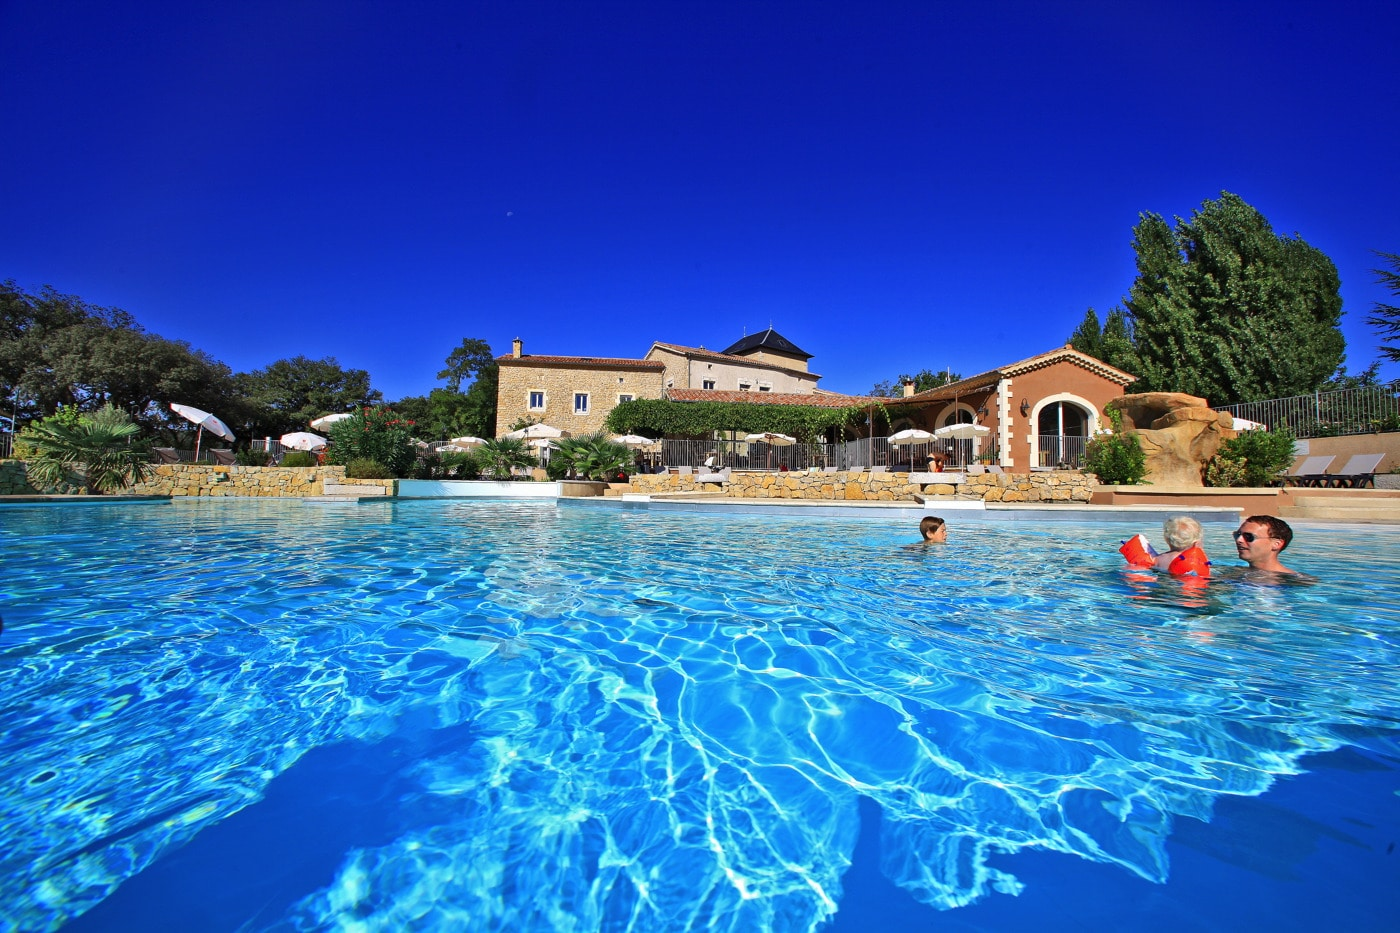 camping Ardèche avec piscine chauffée